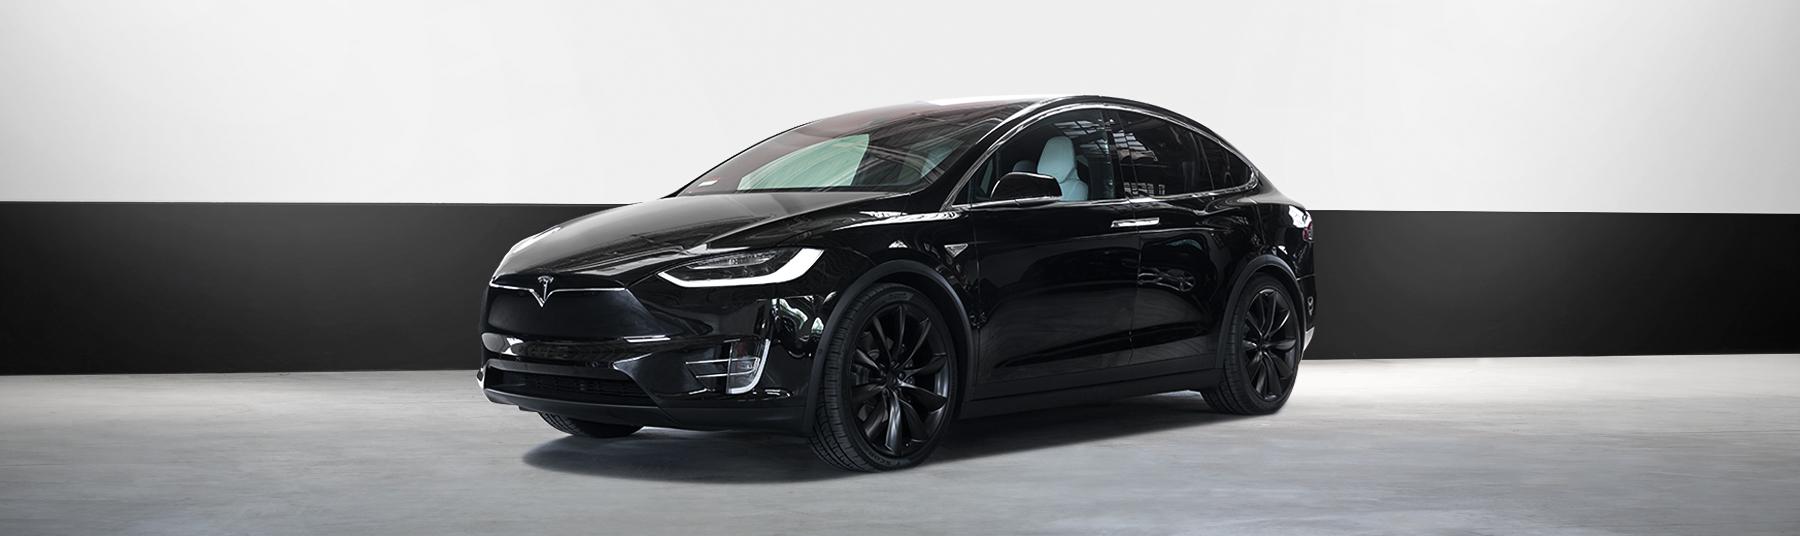 tesla electric car rental x1000d in black